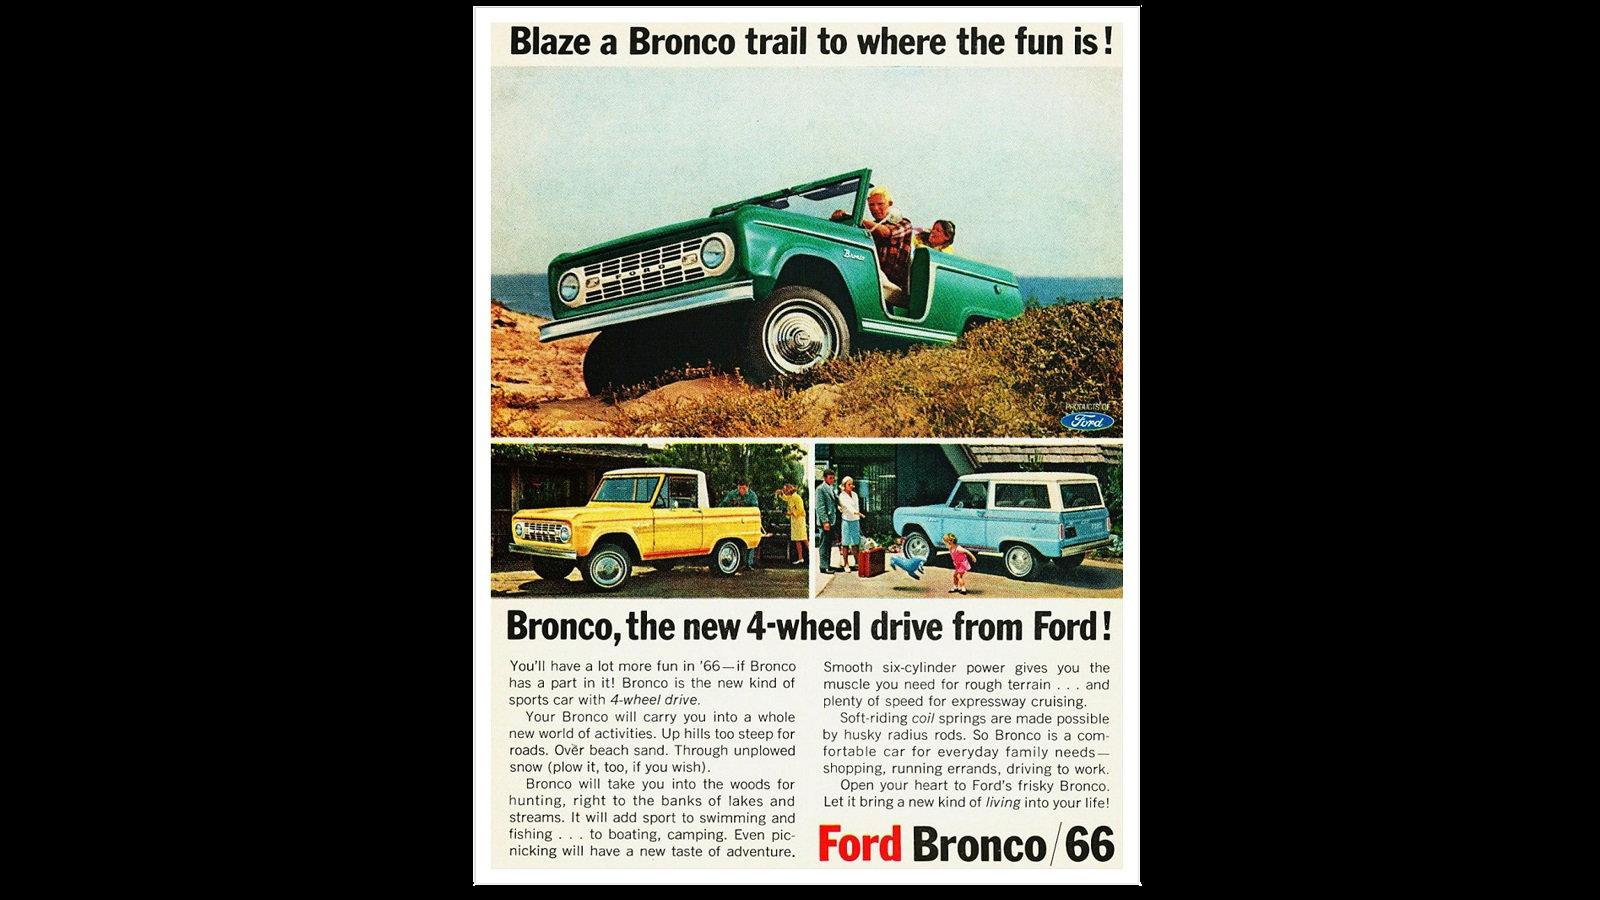 Bronco: The Four Wheel Drive Sports Car